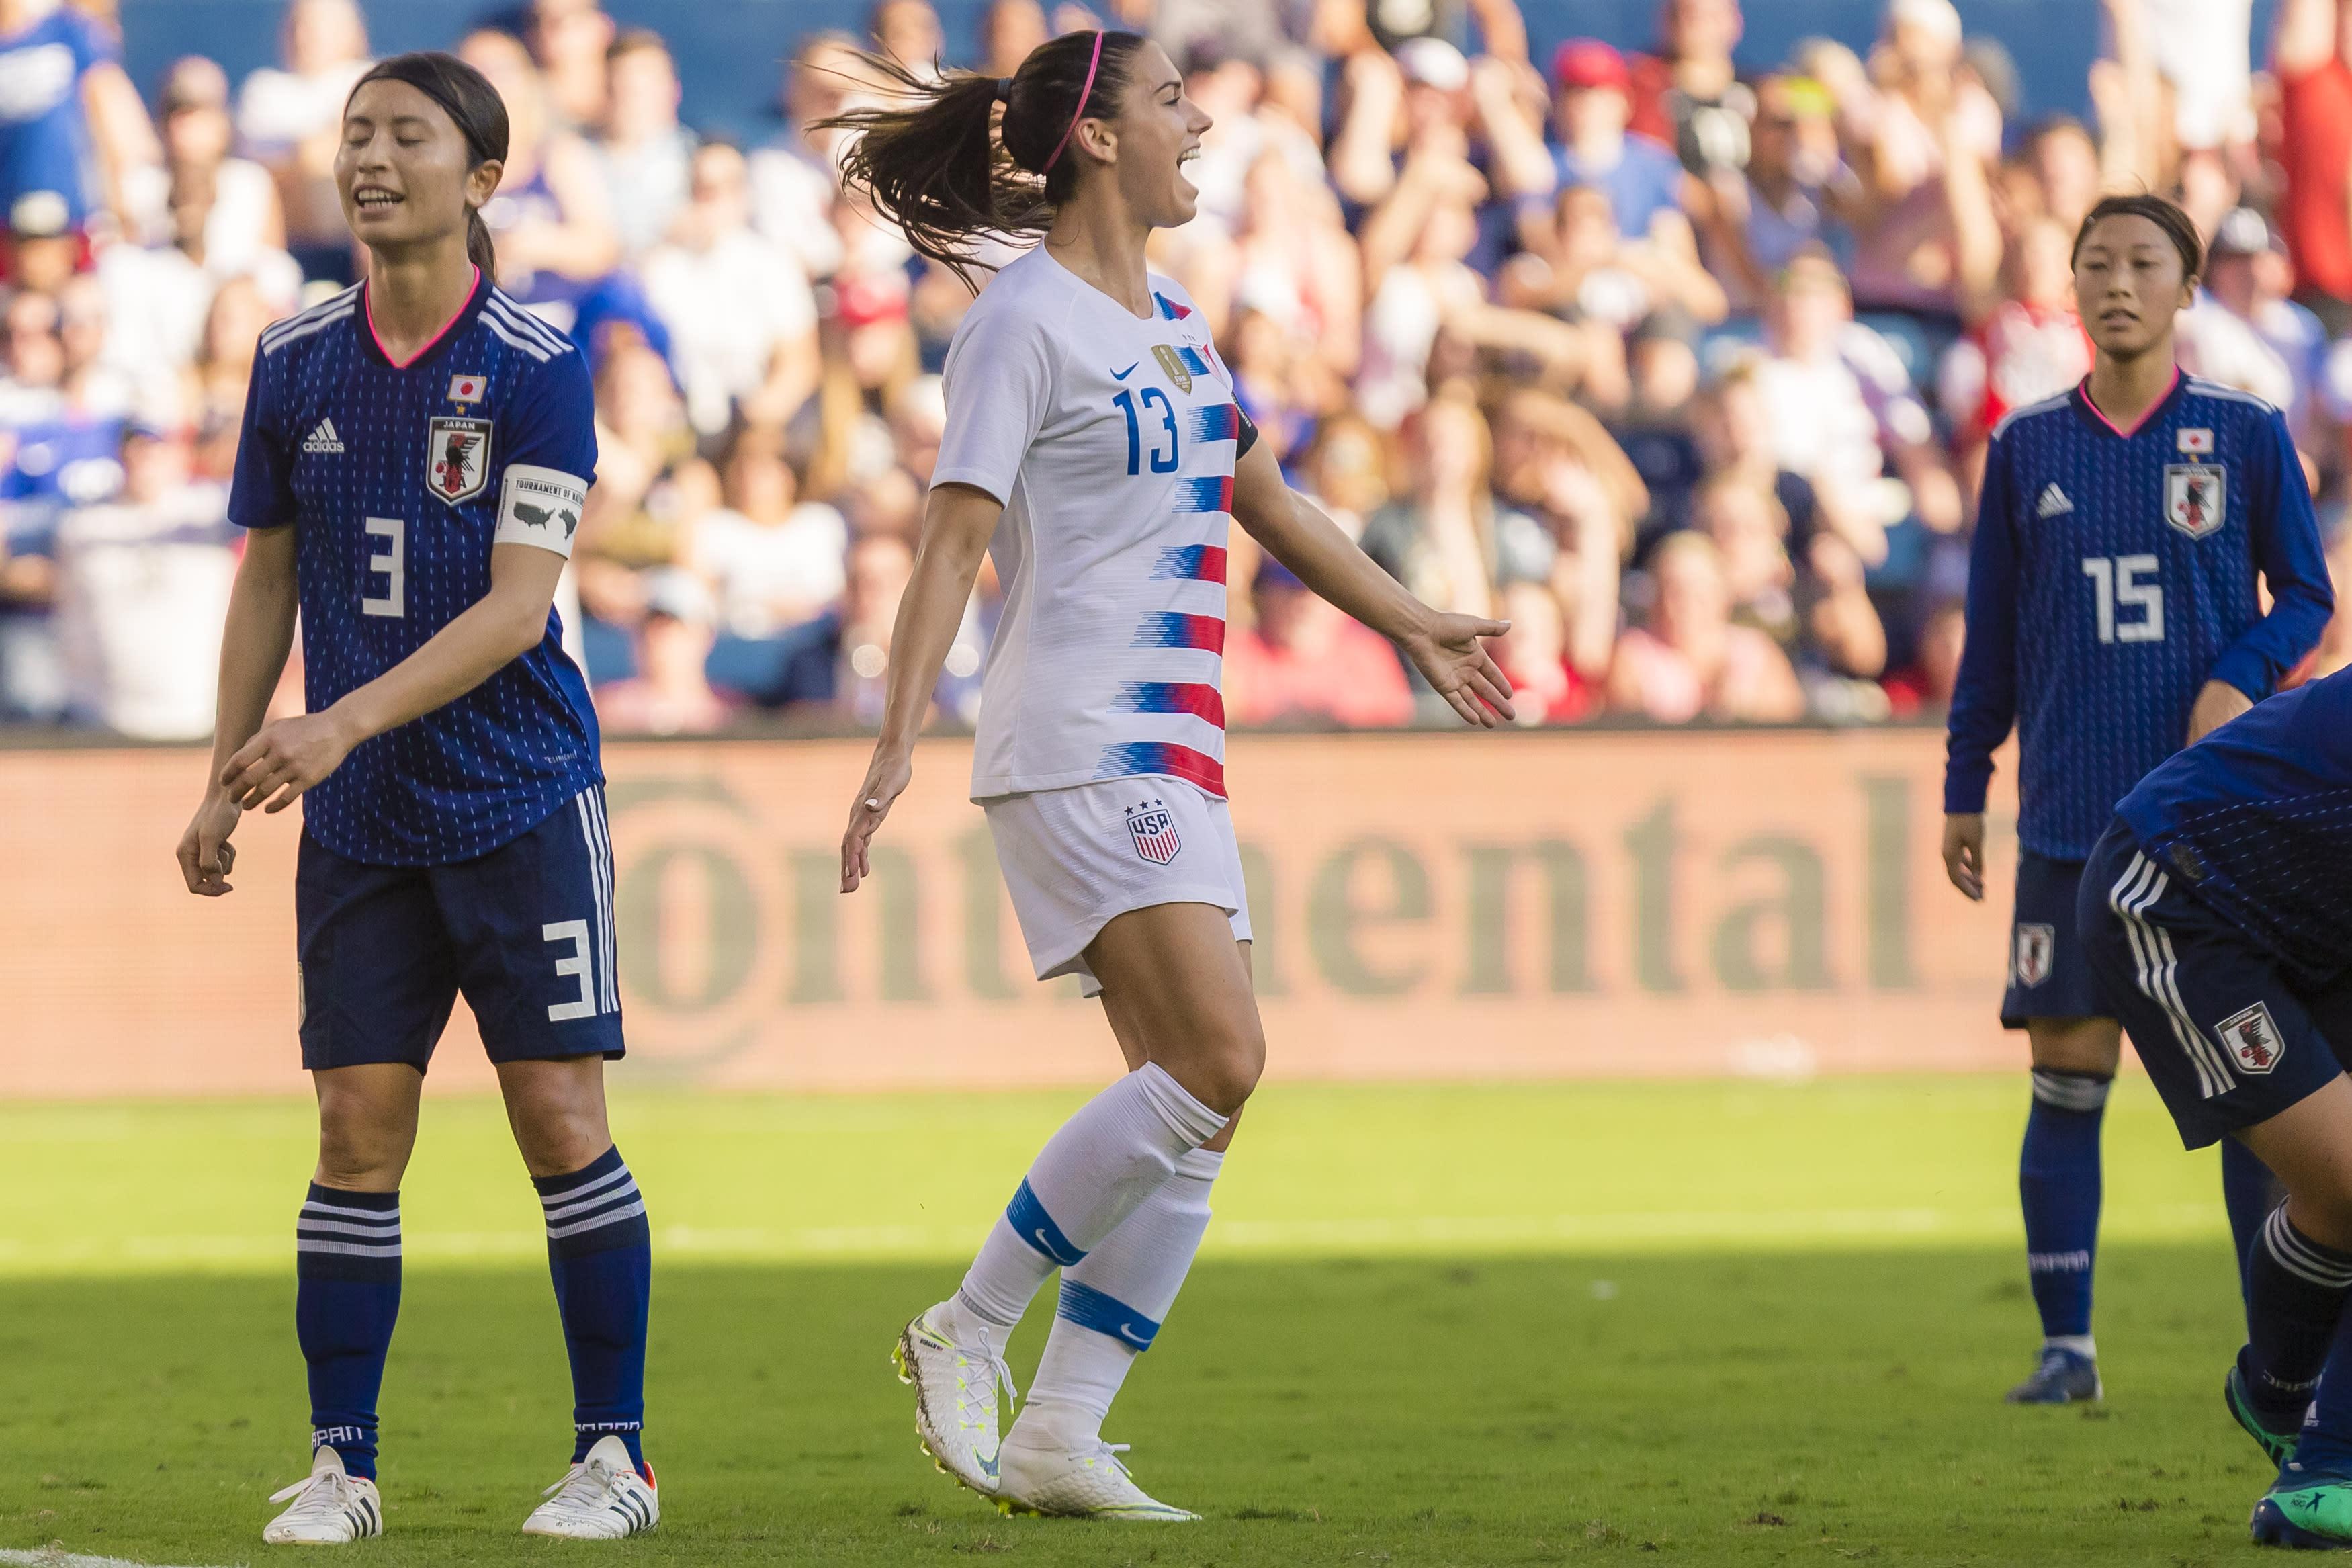 482d2f88e Us Womens Soccer Team T Shirts Controversy - Nils Stucki Kieferorthopäde